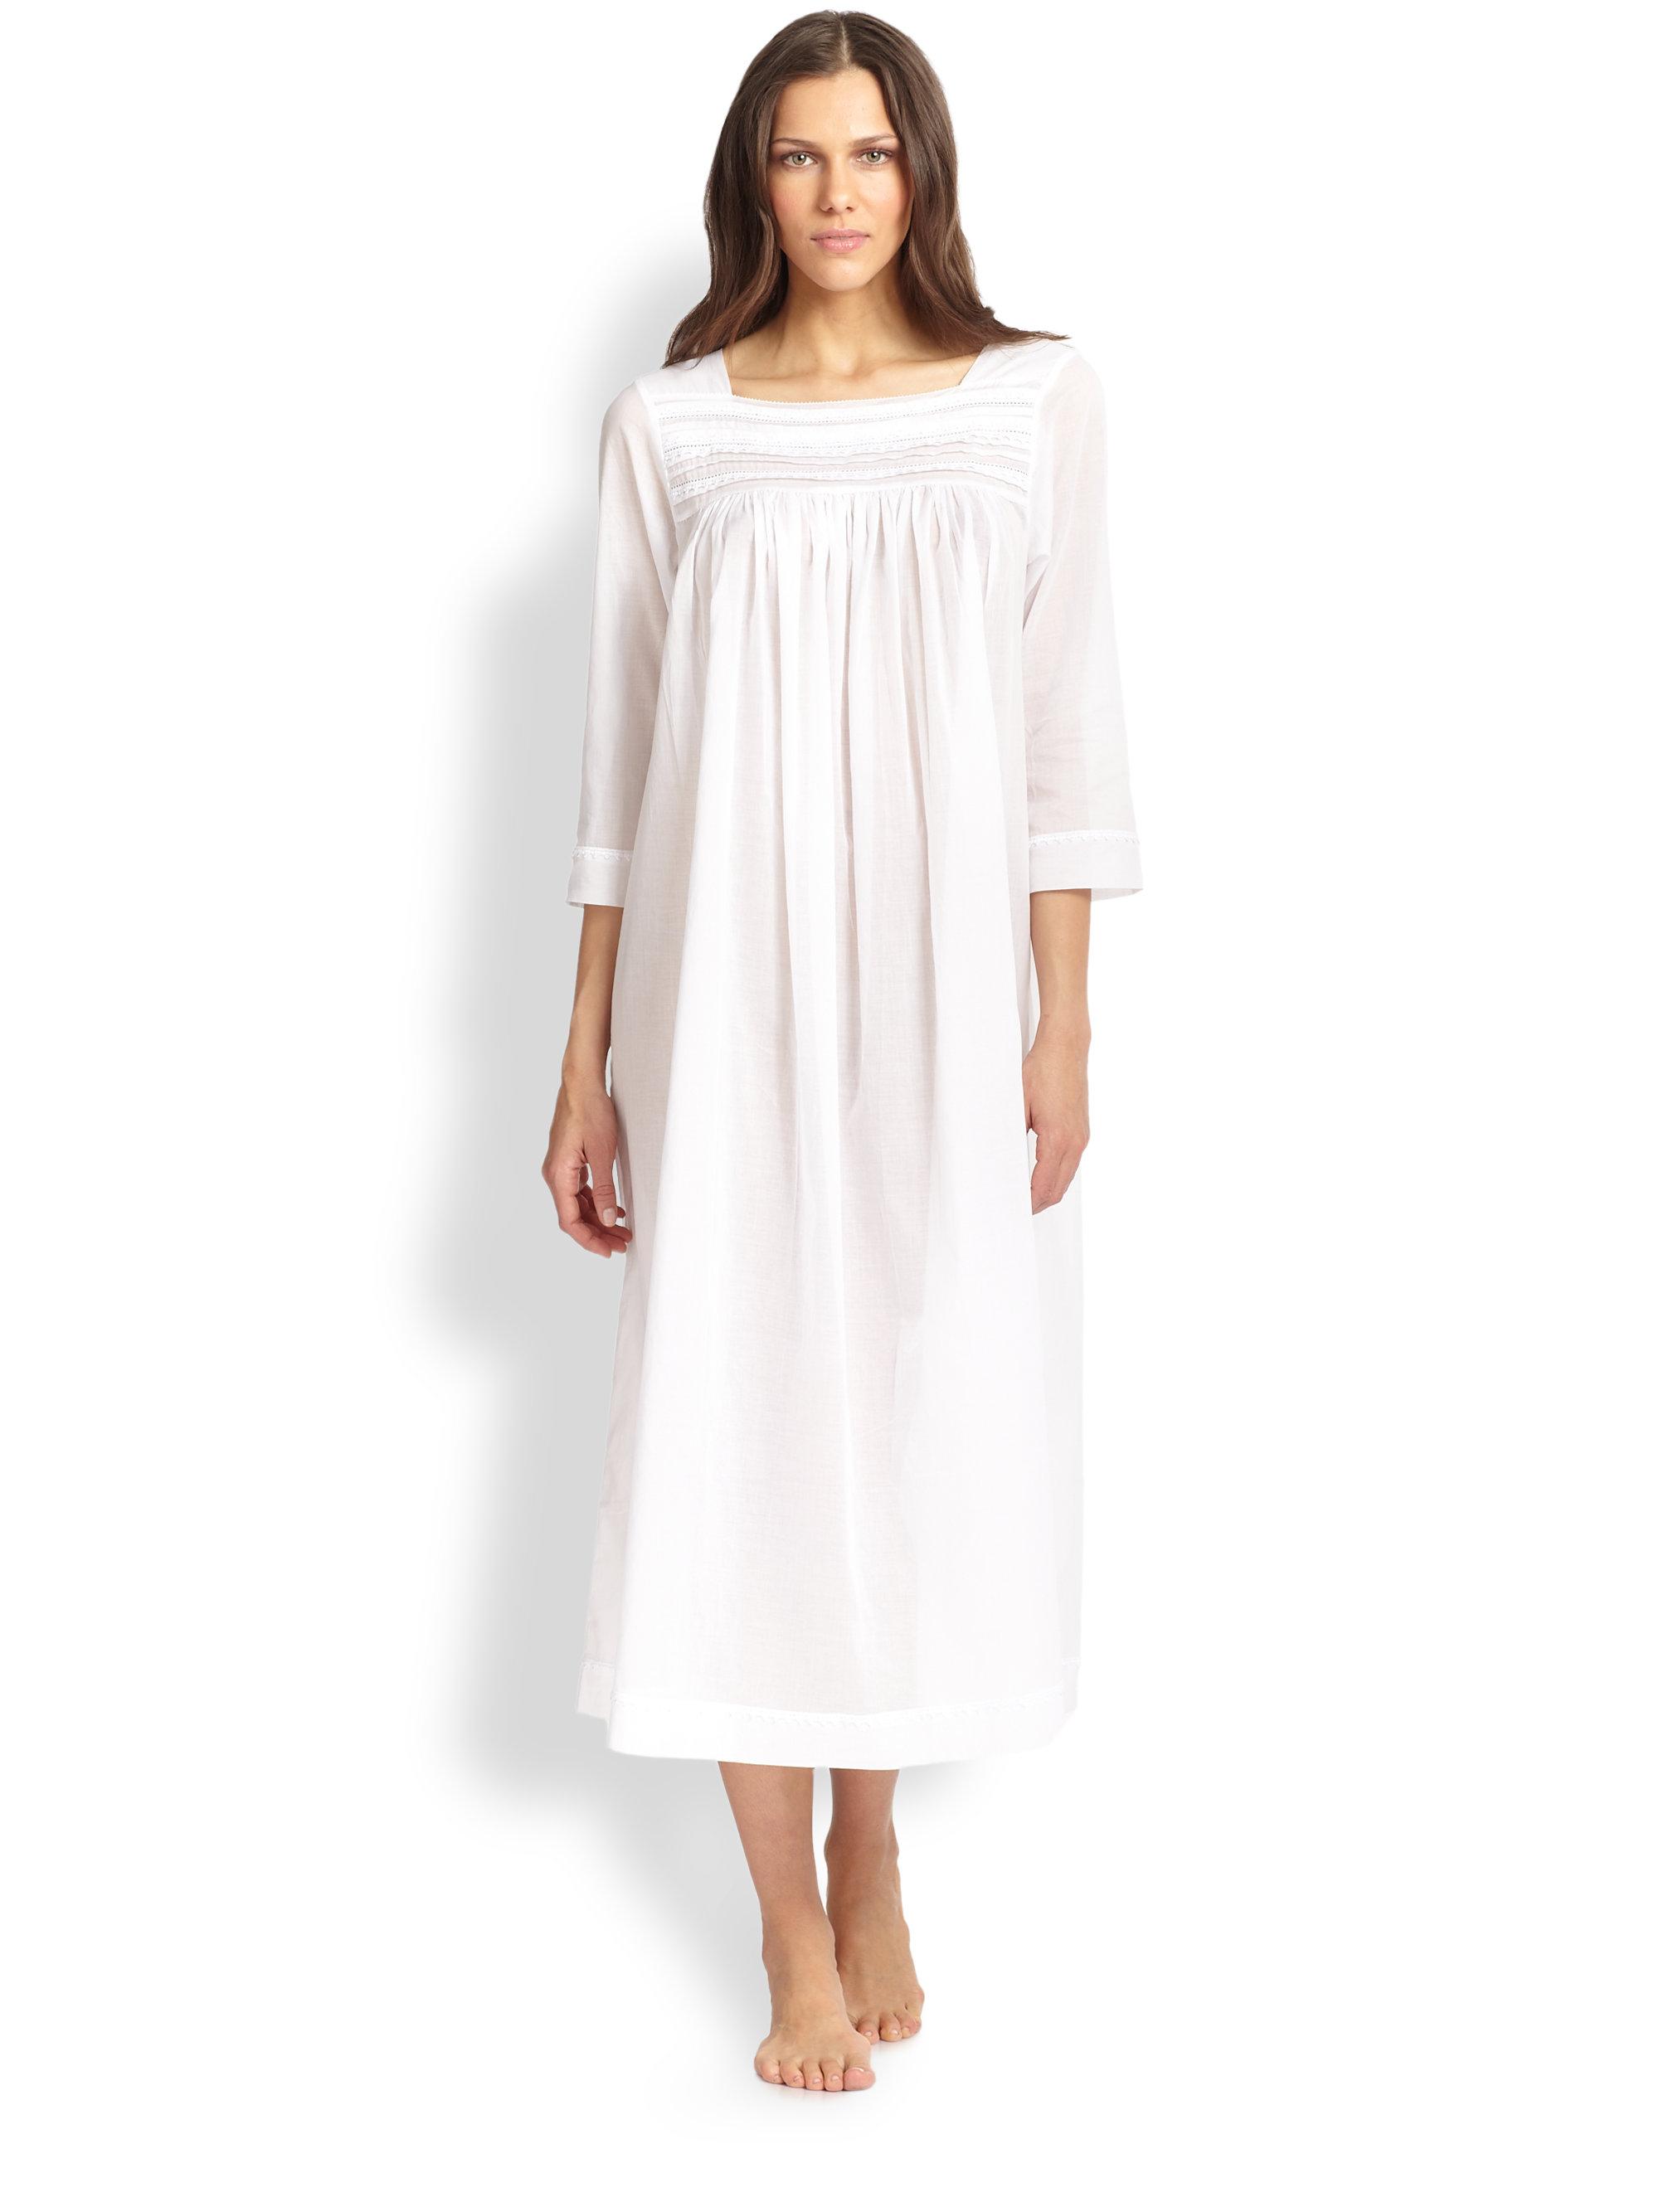 Oscar De La Renta Sheer Cotton Lacetrim Nightgown In White